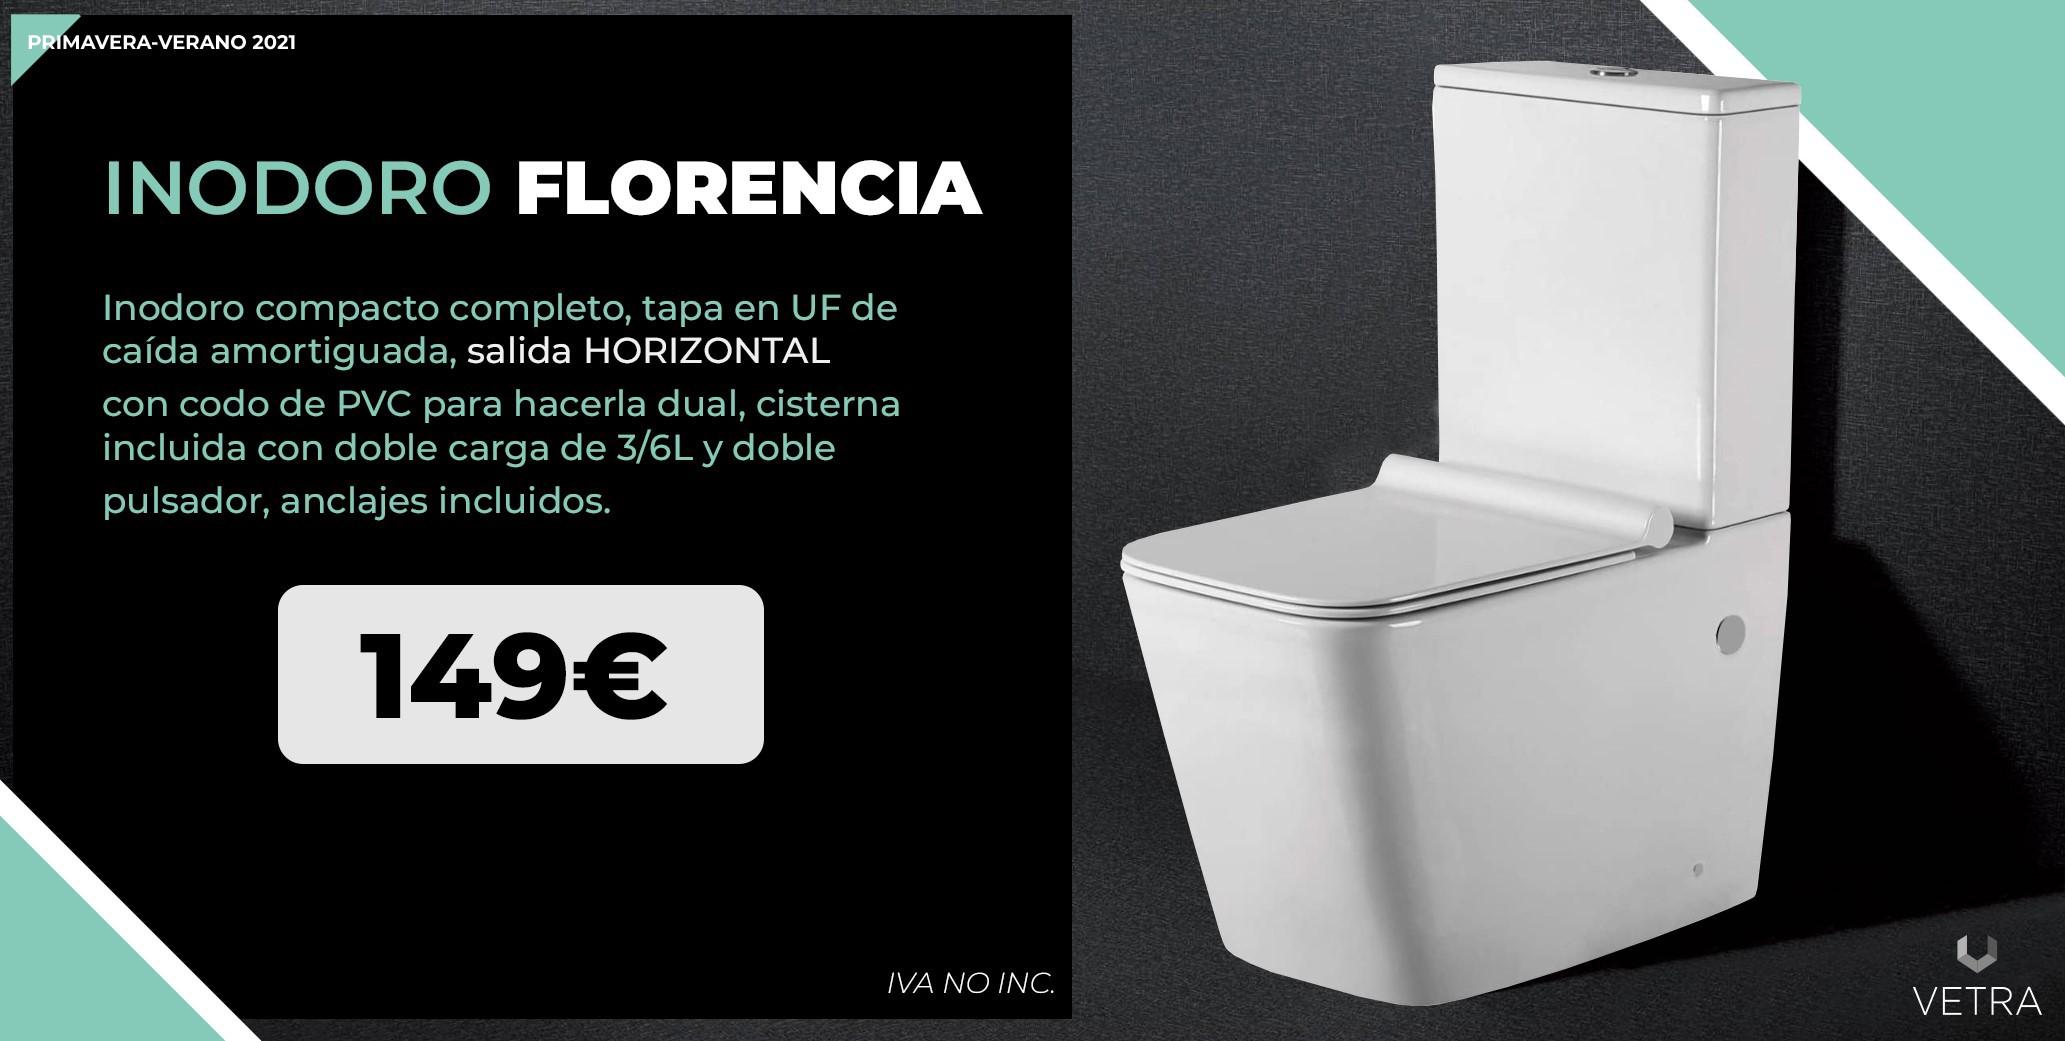 Inodoro FLORENCIA